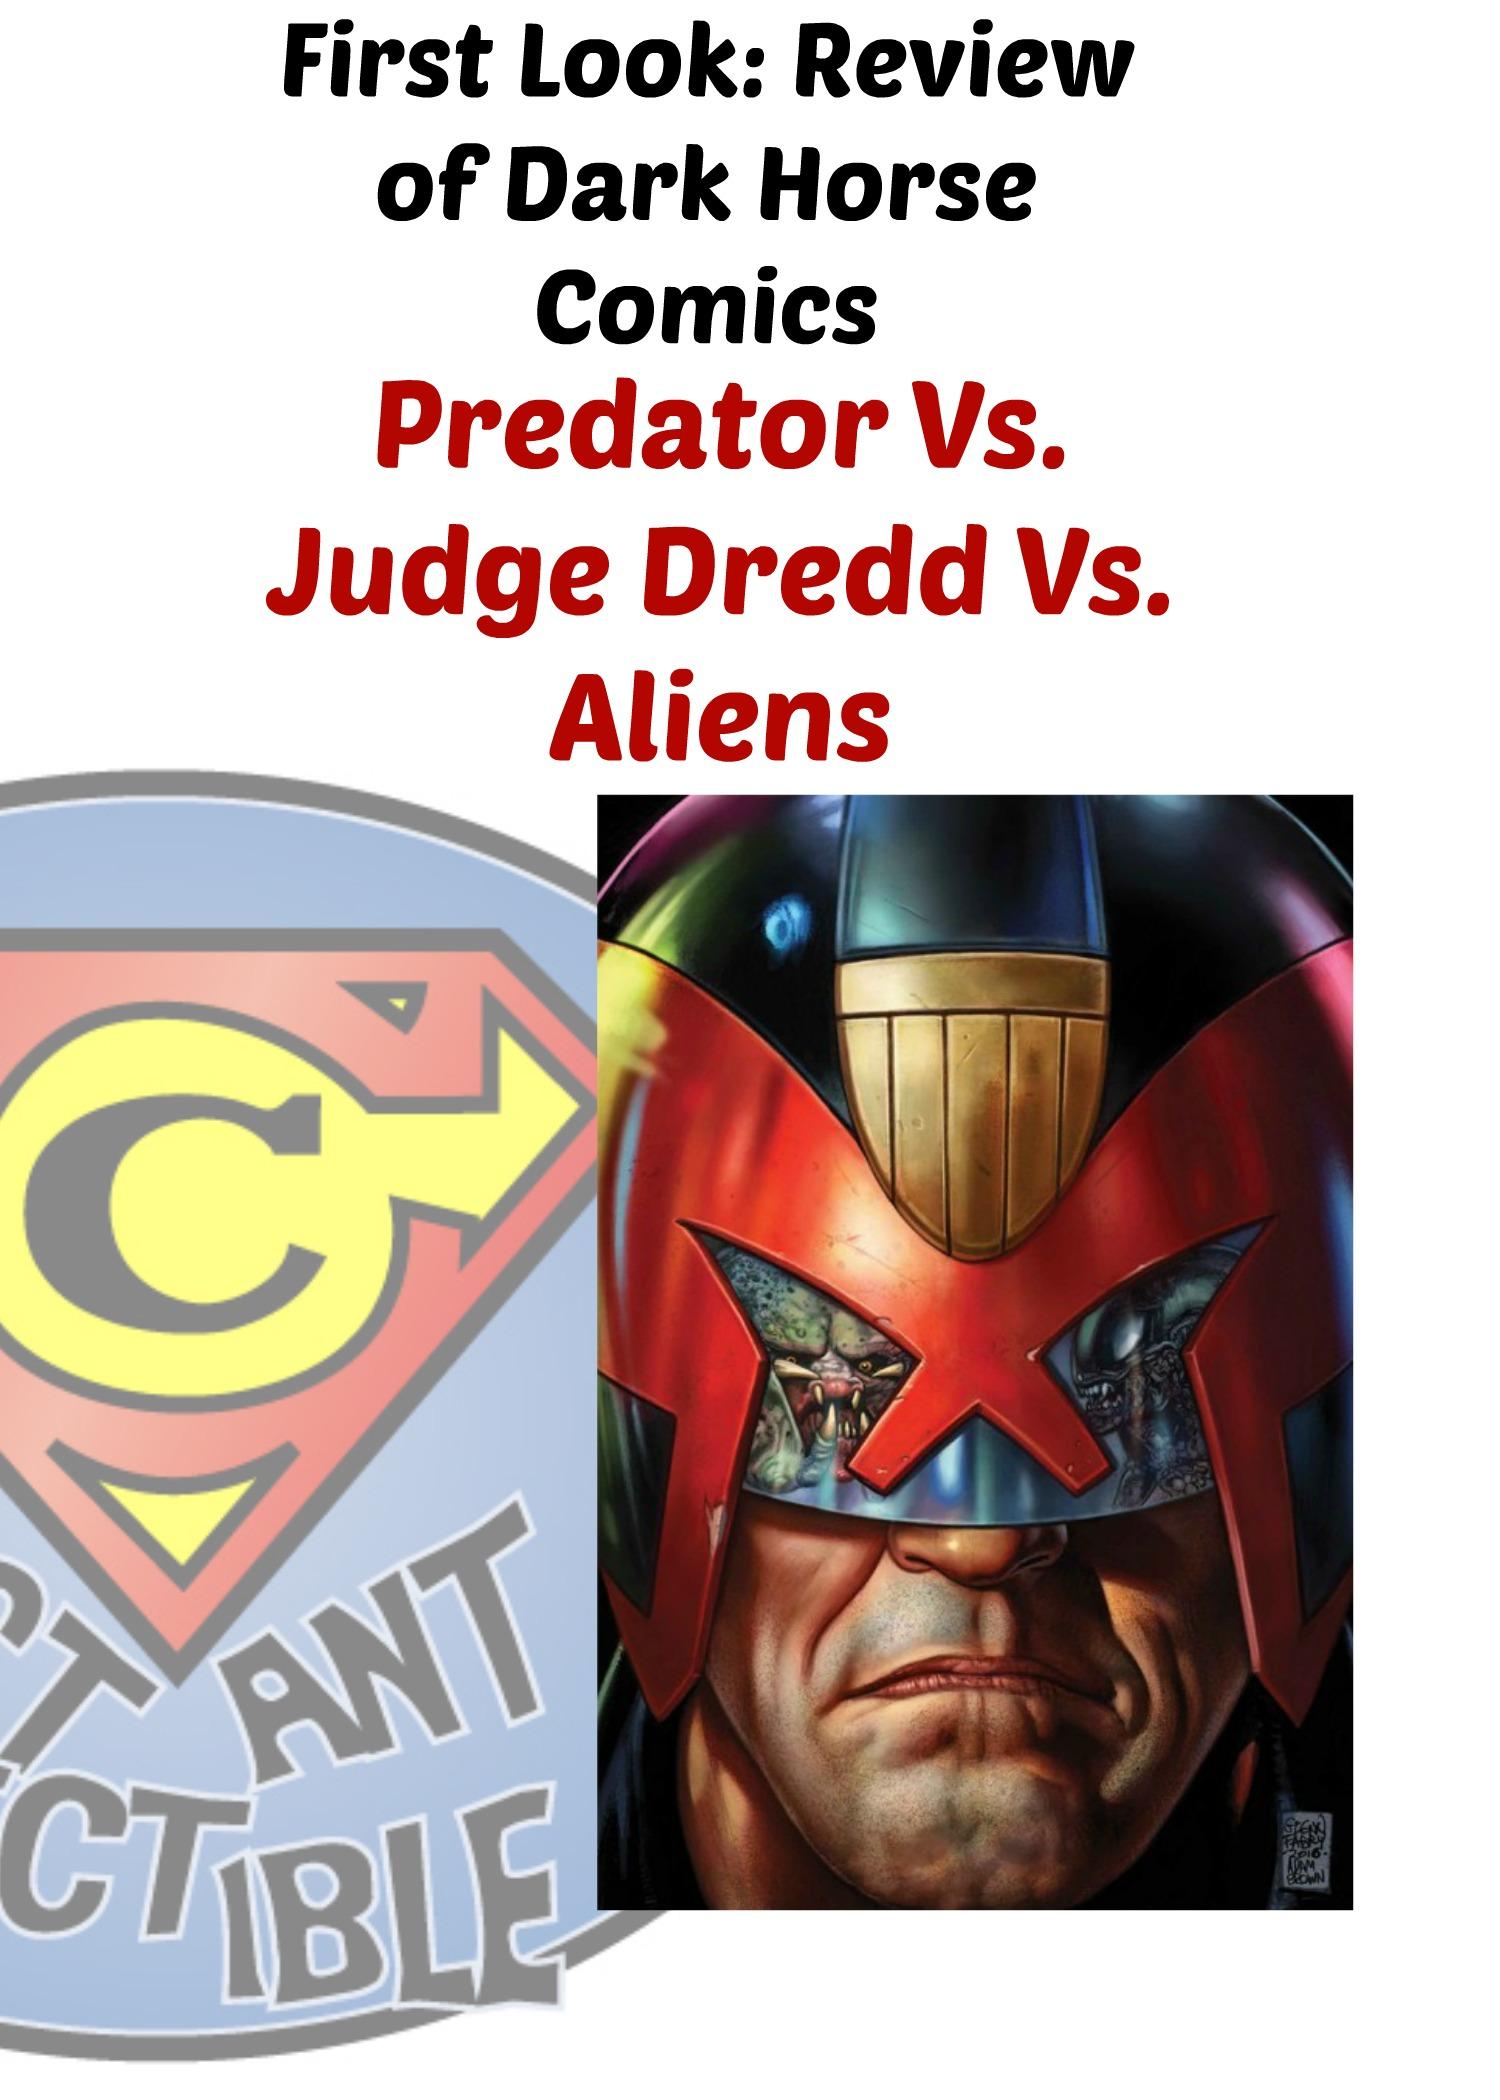 First Look Review of @DarkHorseComics Predator Vs. Judge Dredd Vs. Aliens - Constant Collectible